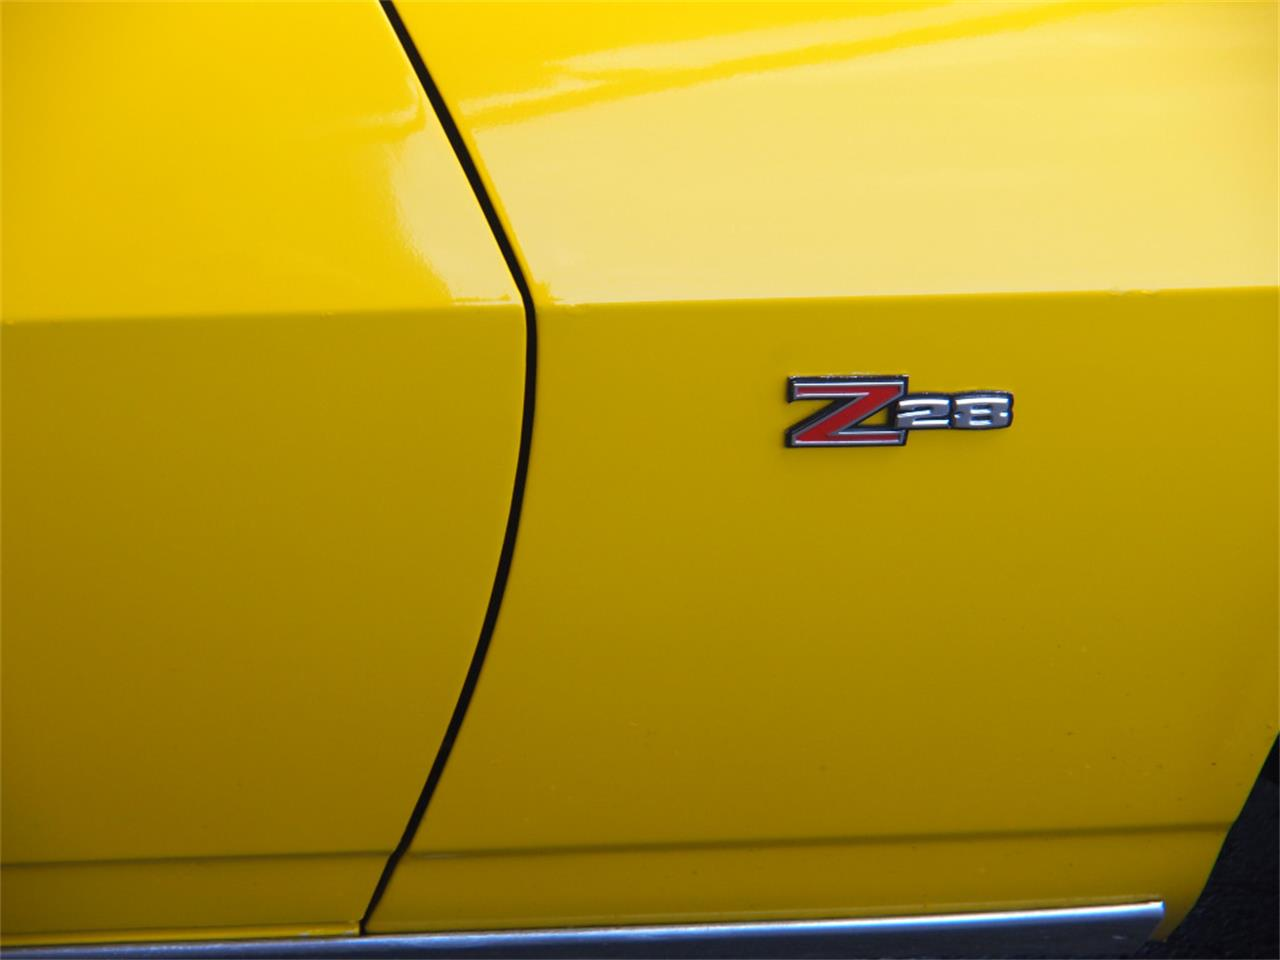 Large Picture of Classic '71 Camaro located in North Canton Ohio - $37,500.00 - KYTQ